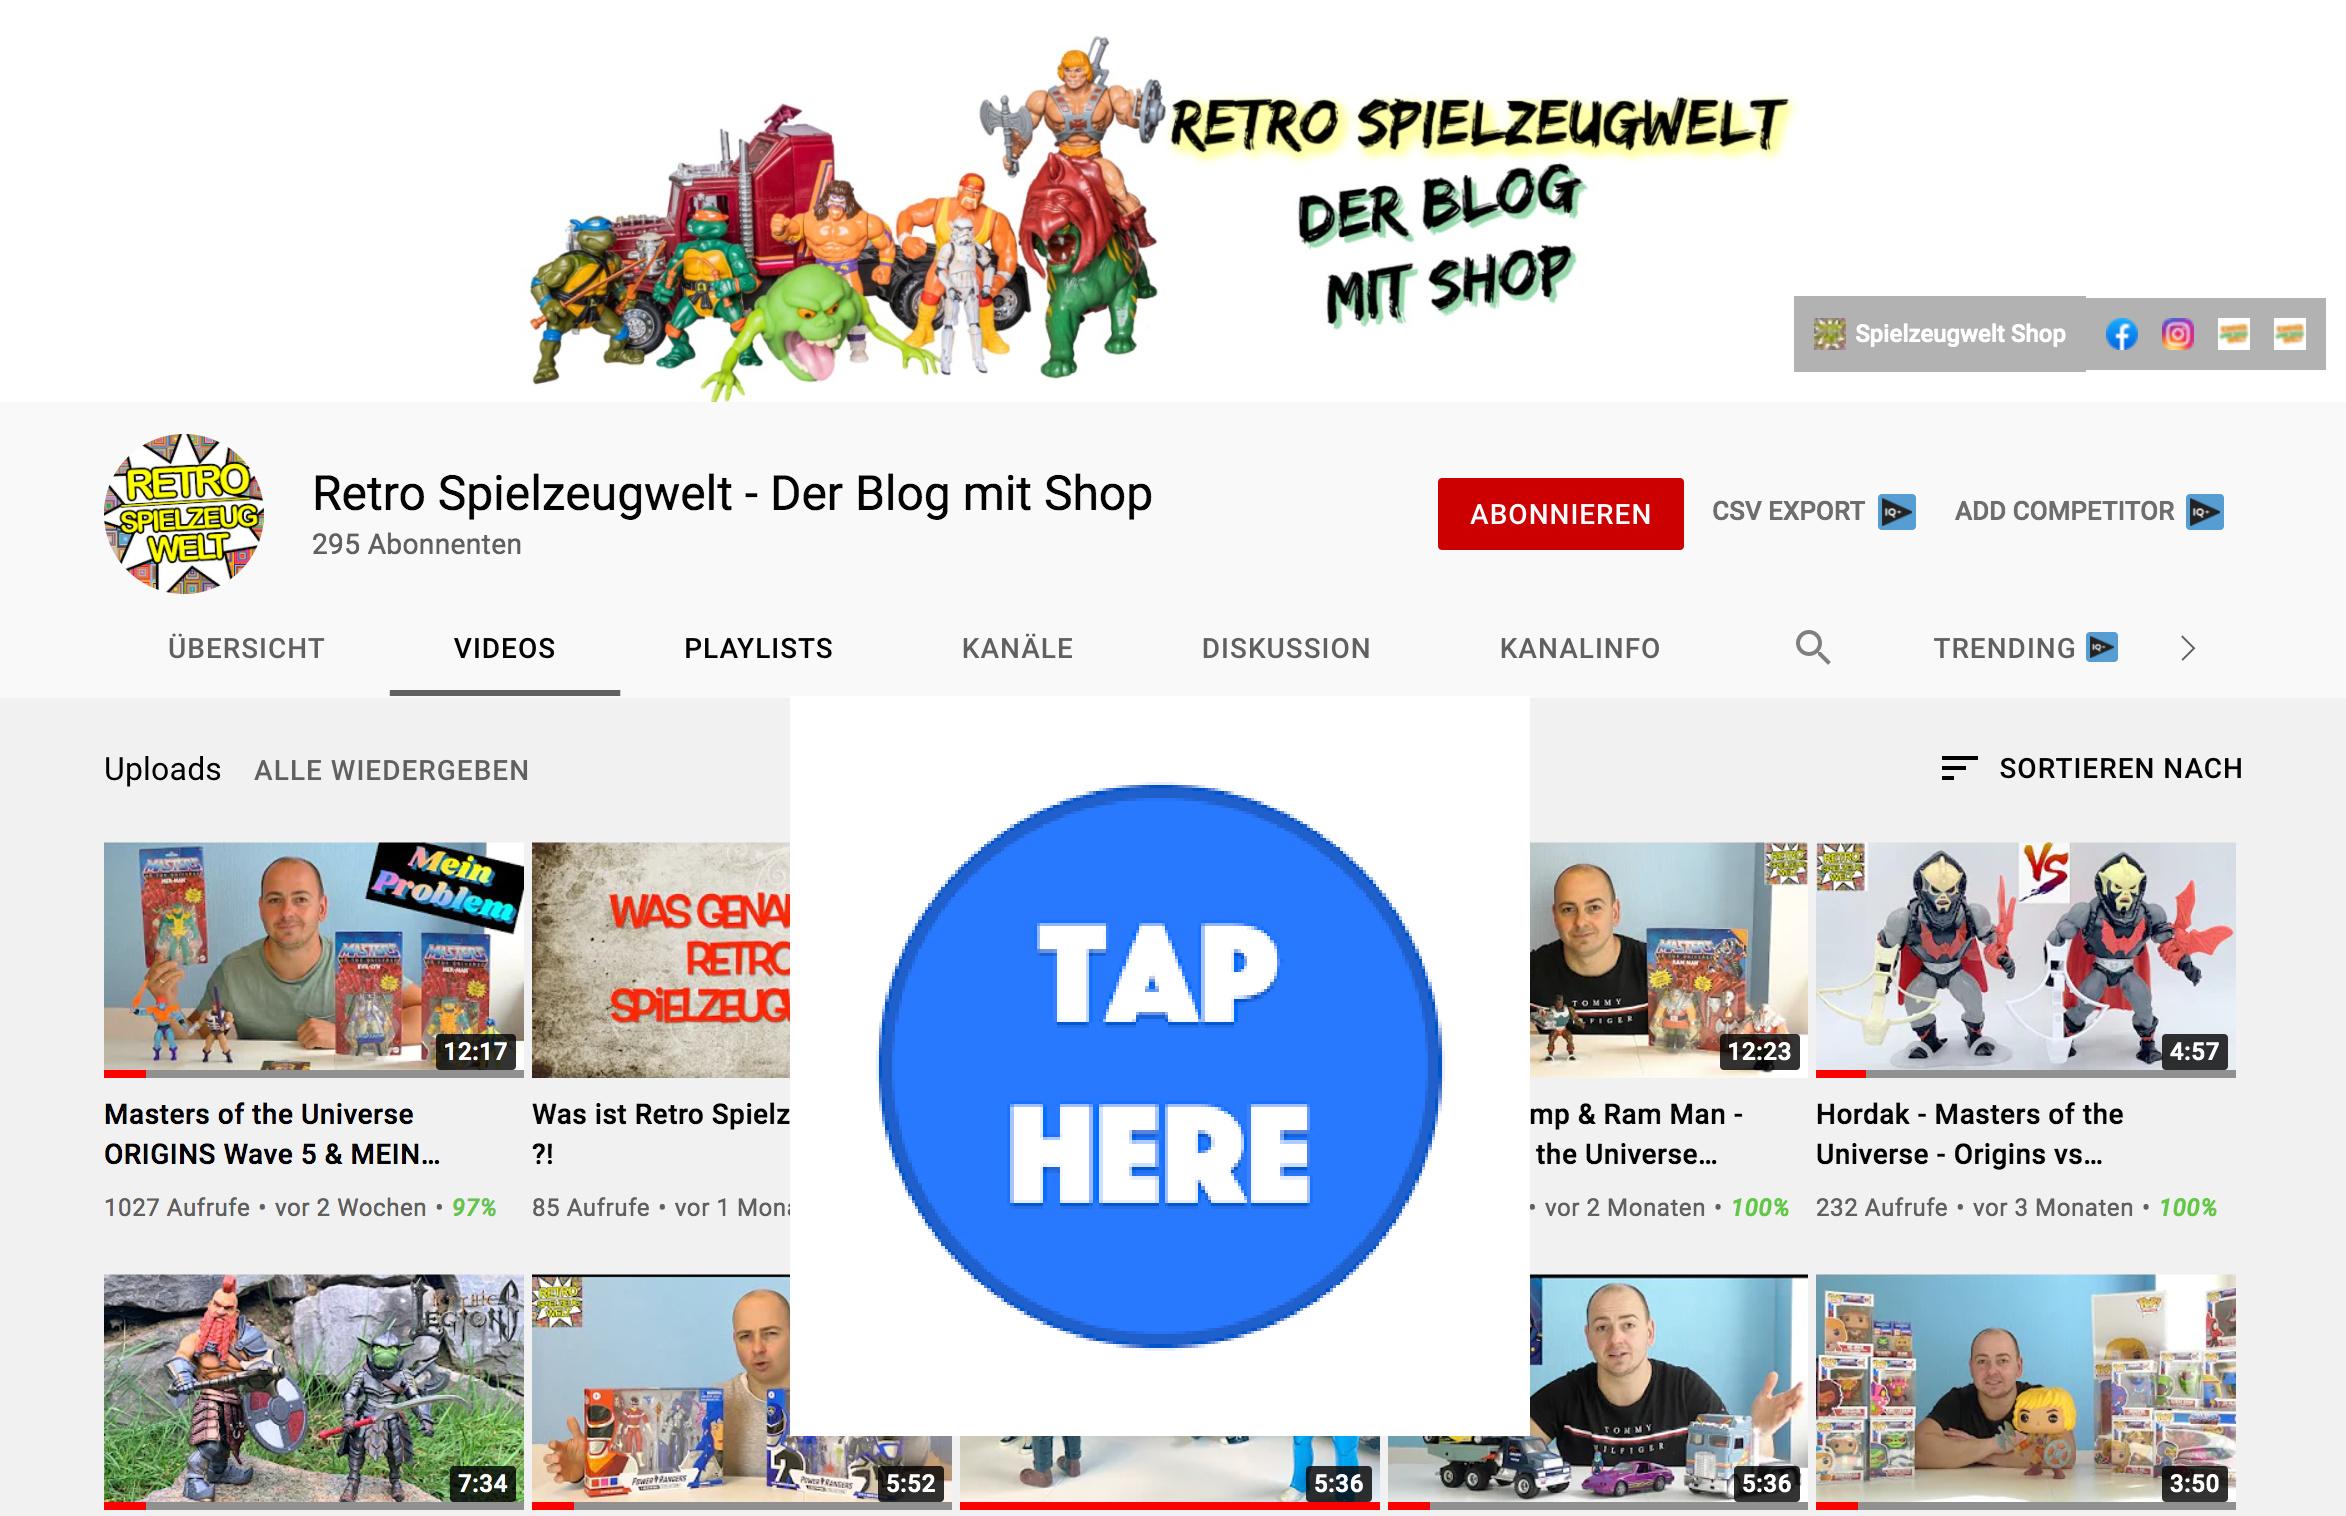 Retro Spielzeugwelt Youtube